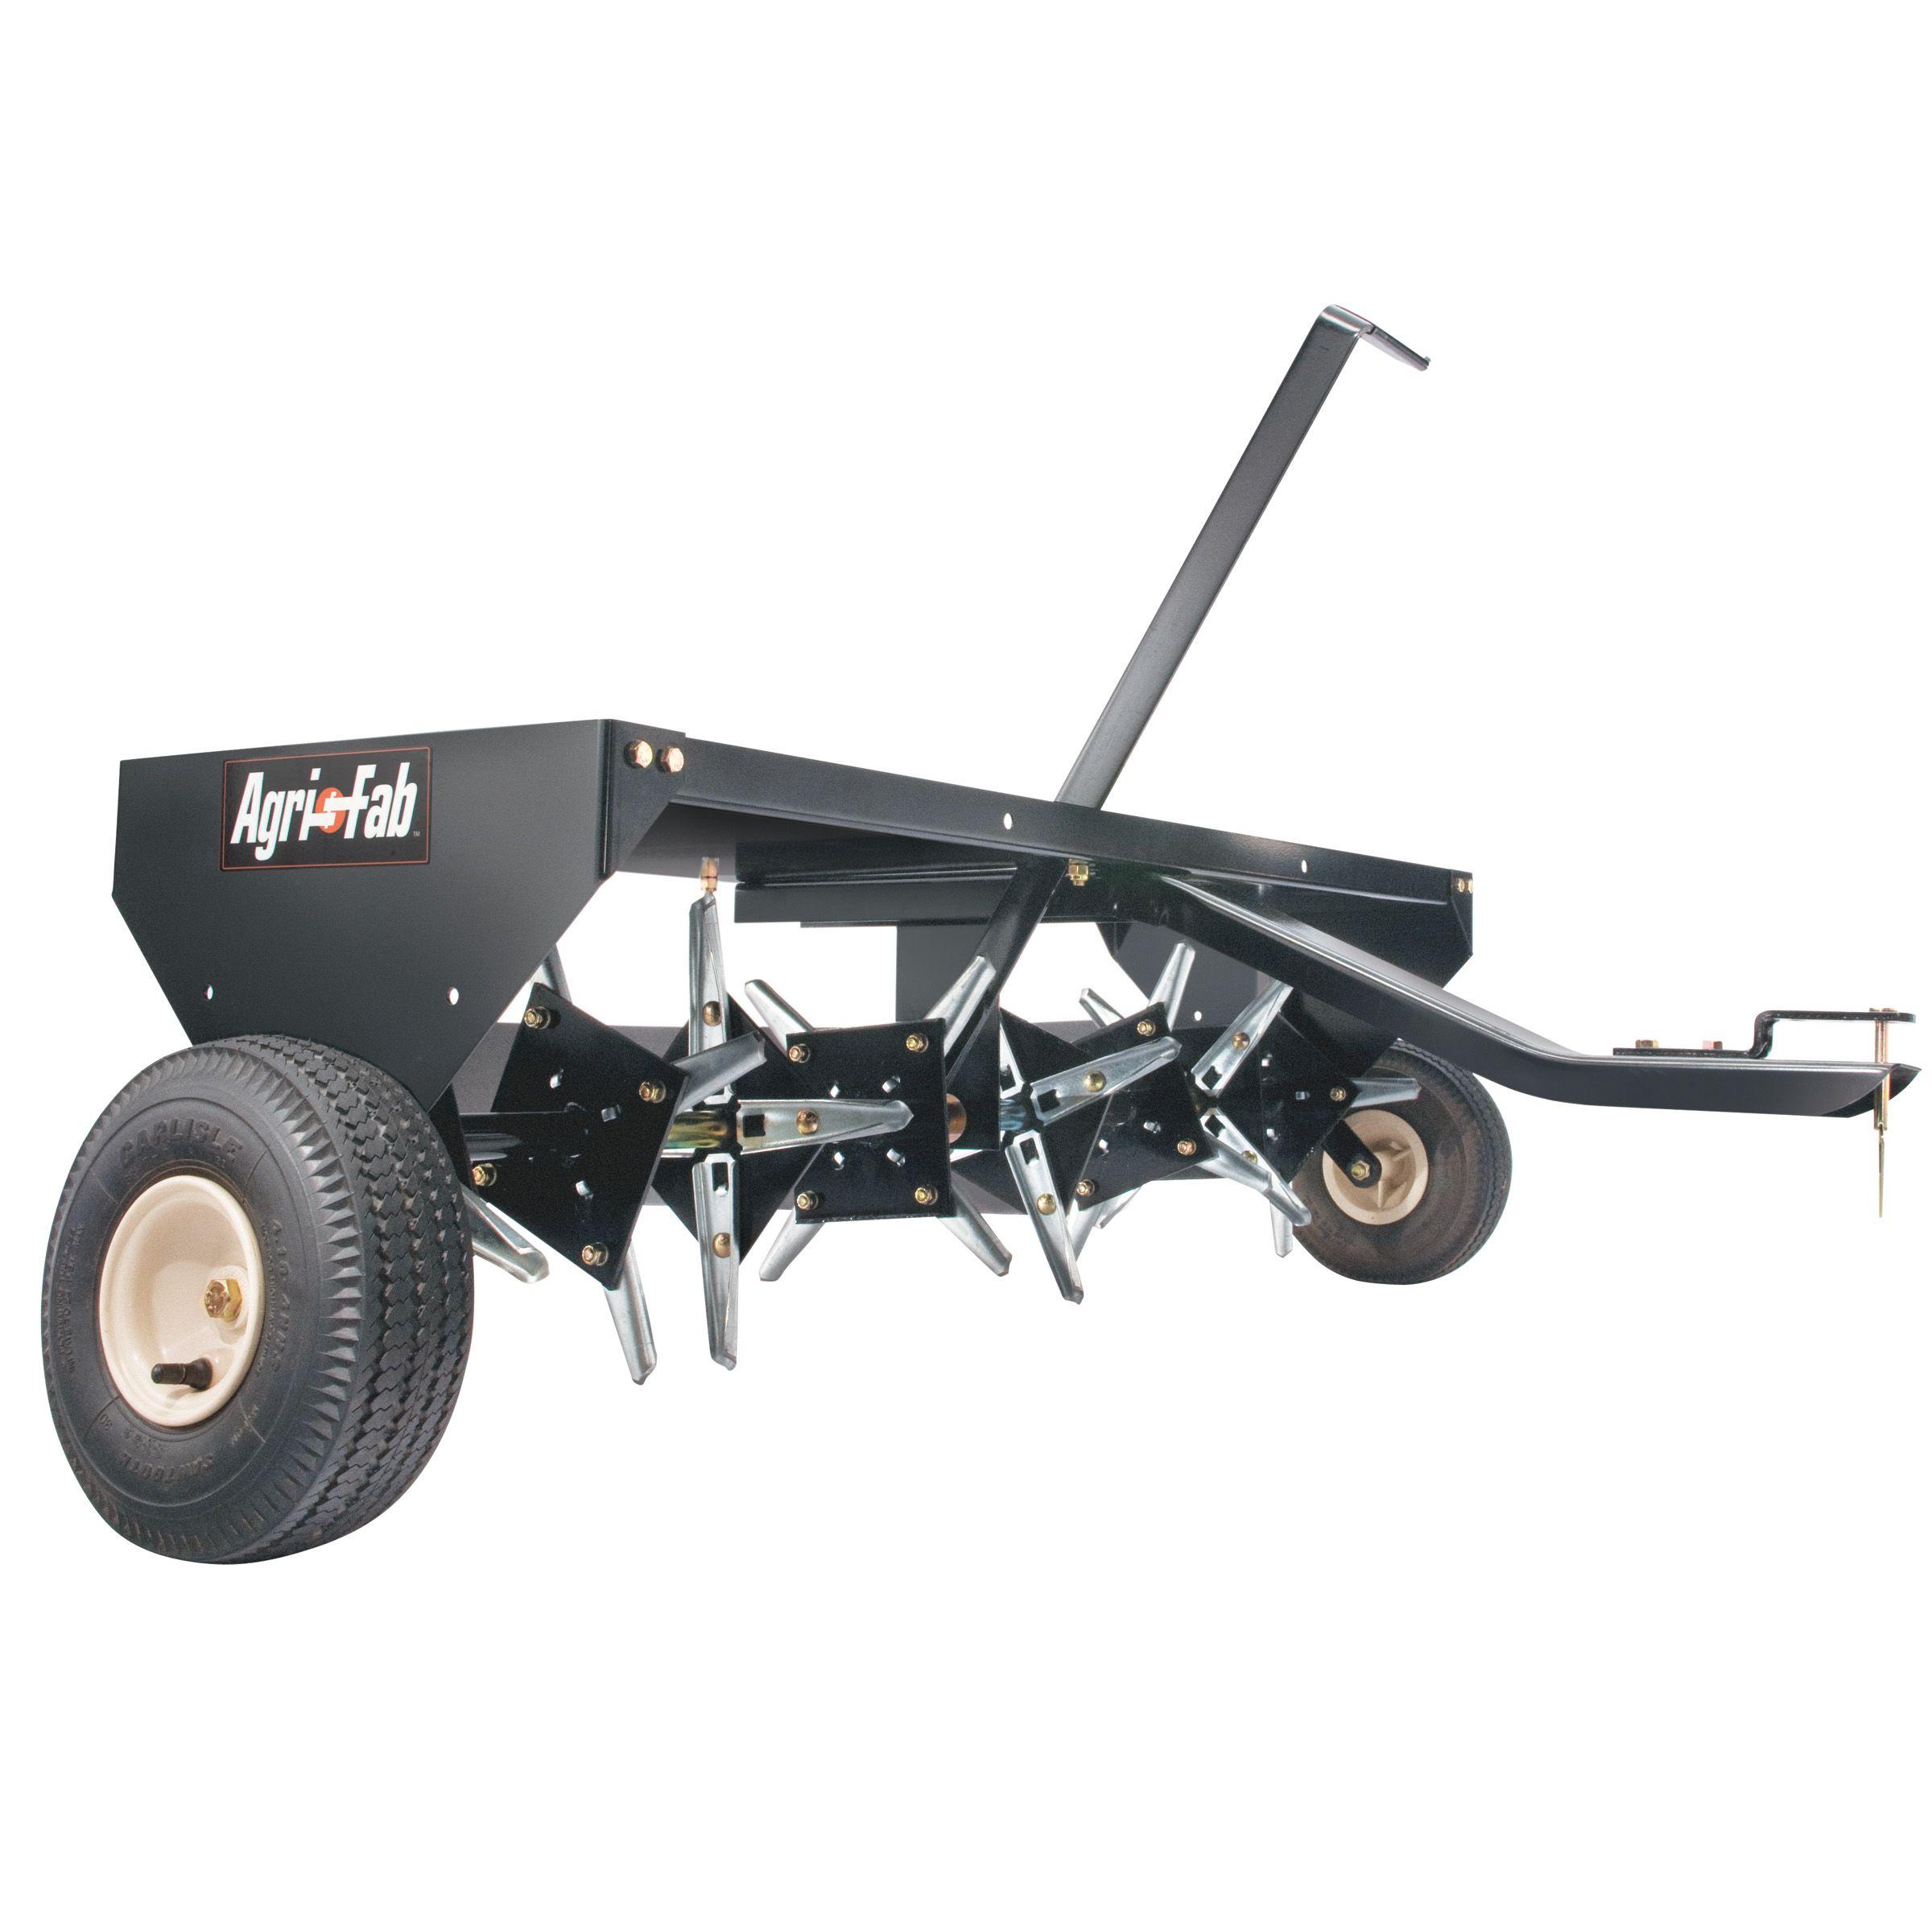 Agri-fab 48 In. Lawn Aerator - & Garden Tractor